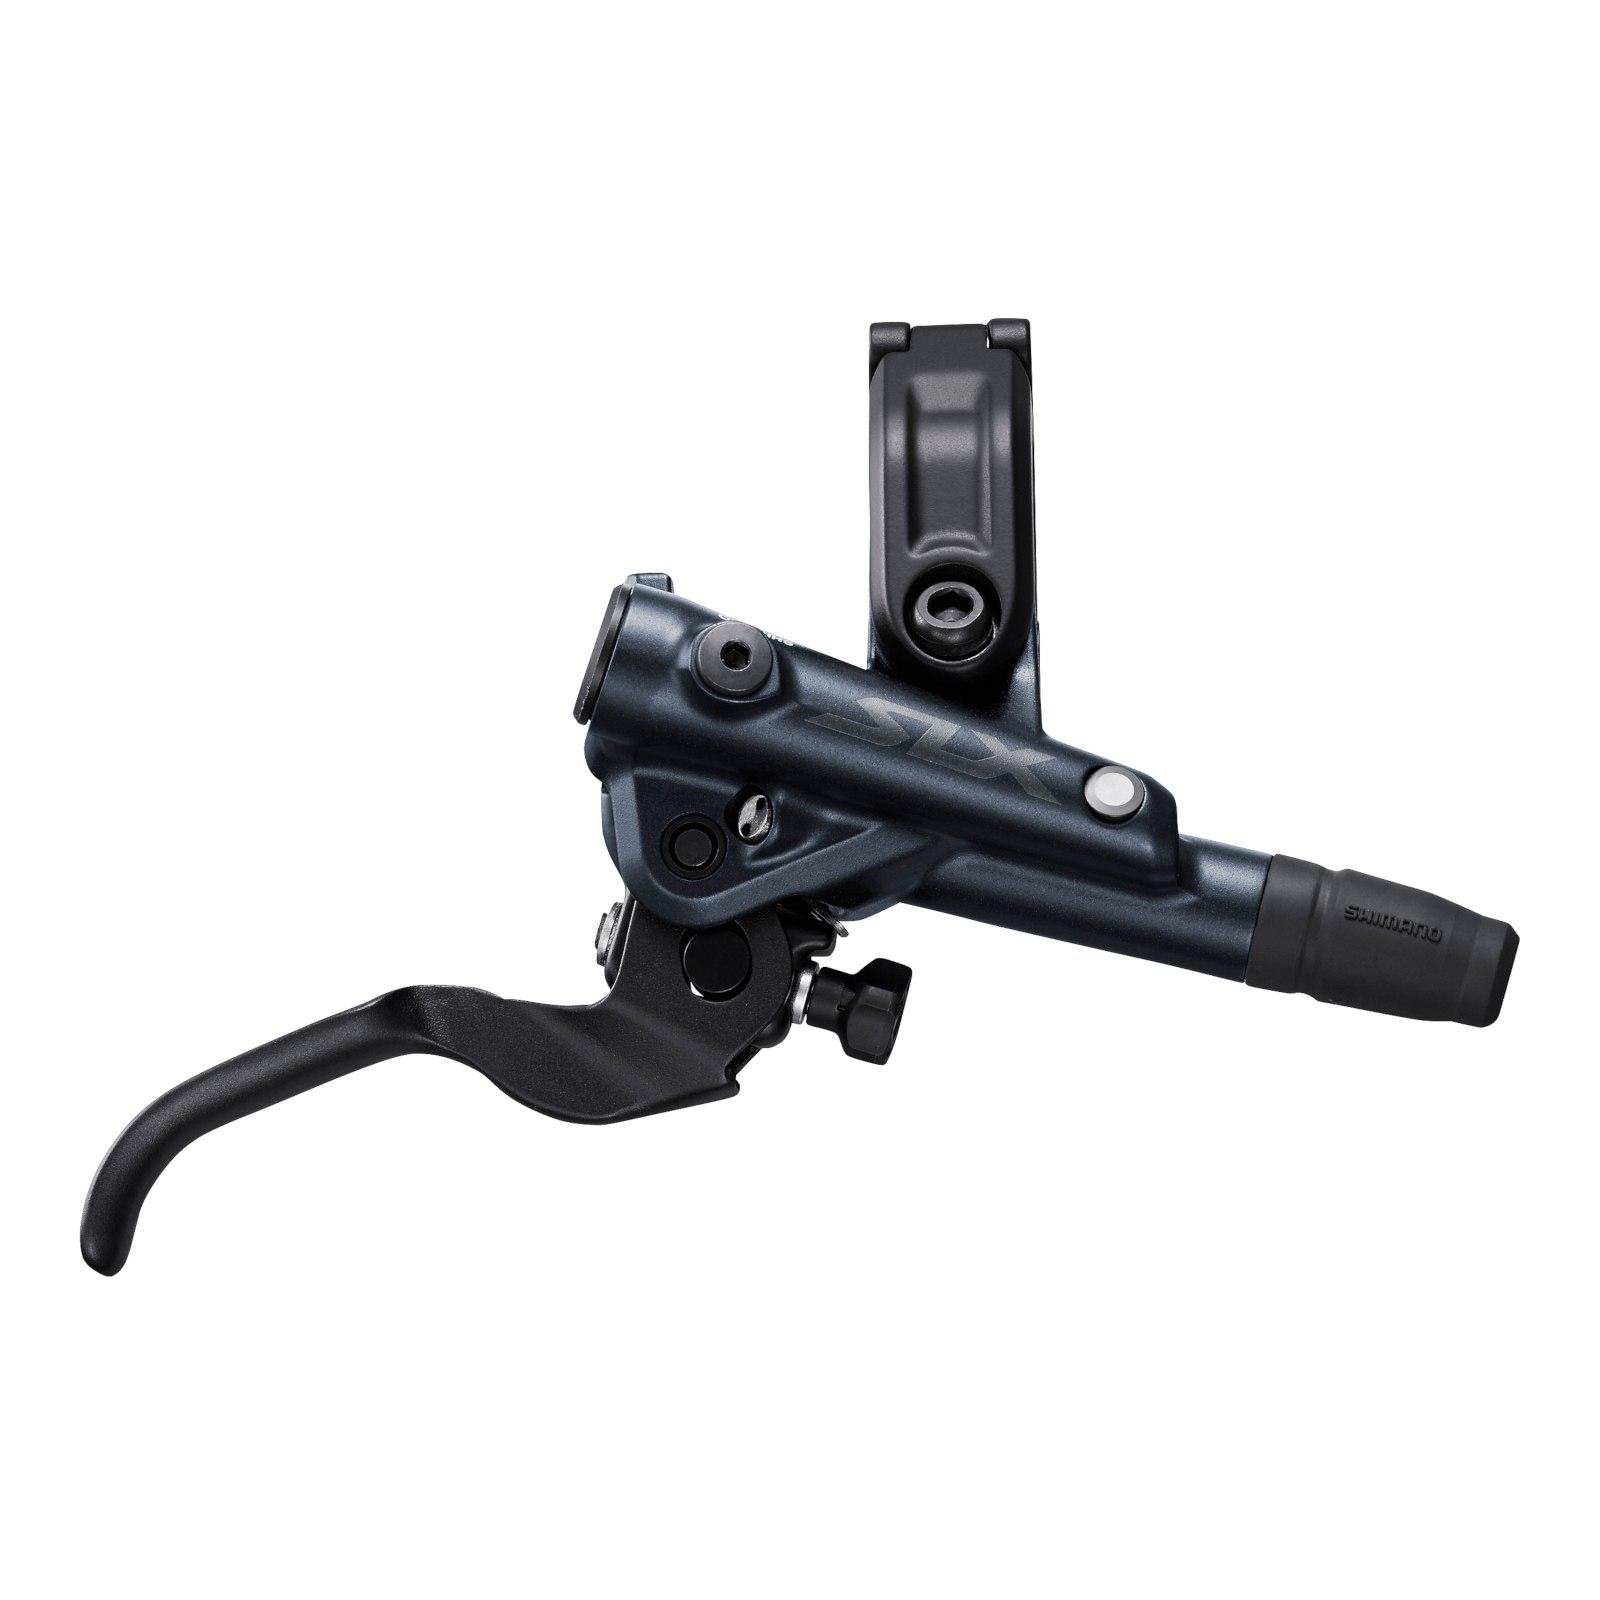 Image of Shimano SLX BL-M7100 + BR-M7120 Enduro / Trail Hydraulic Disc Brake - I-Spec EV - J-Kit - Set RW